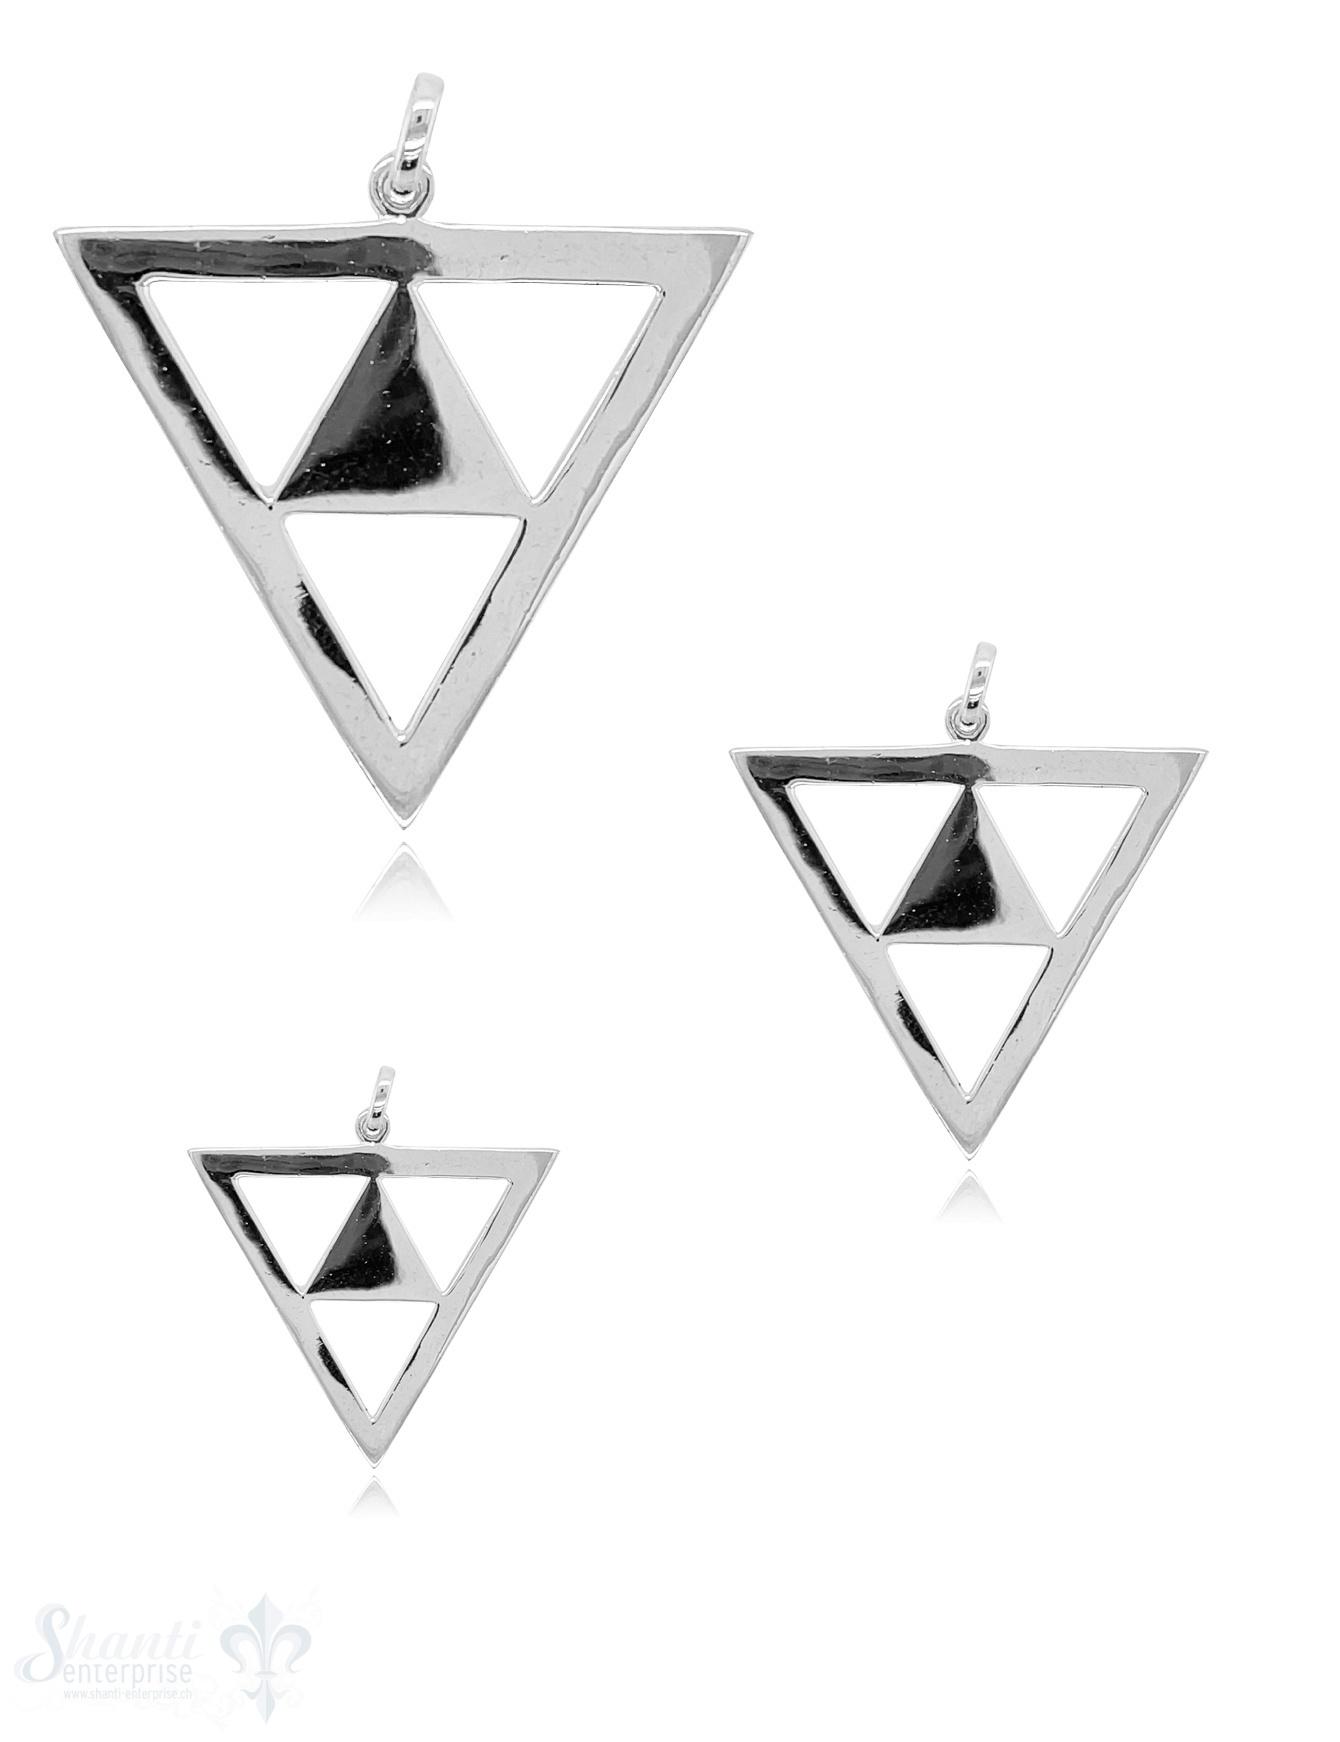 Dreieck Anhänger Silber durchbrochen mit Dreieck gefüllt mit Öse